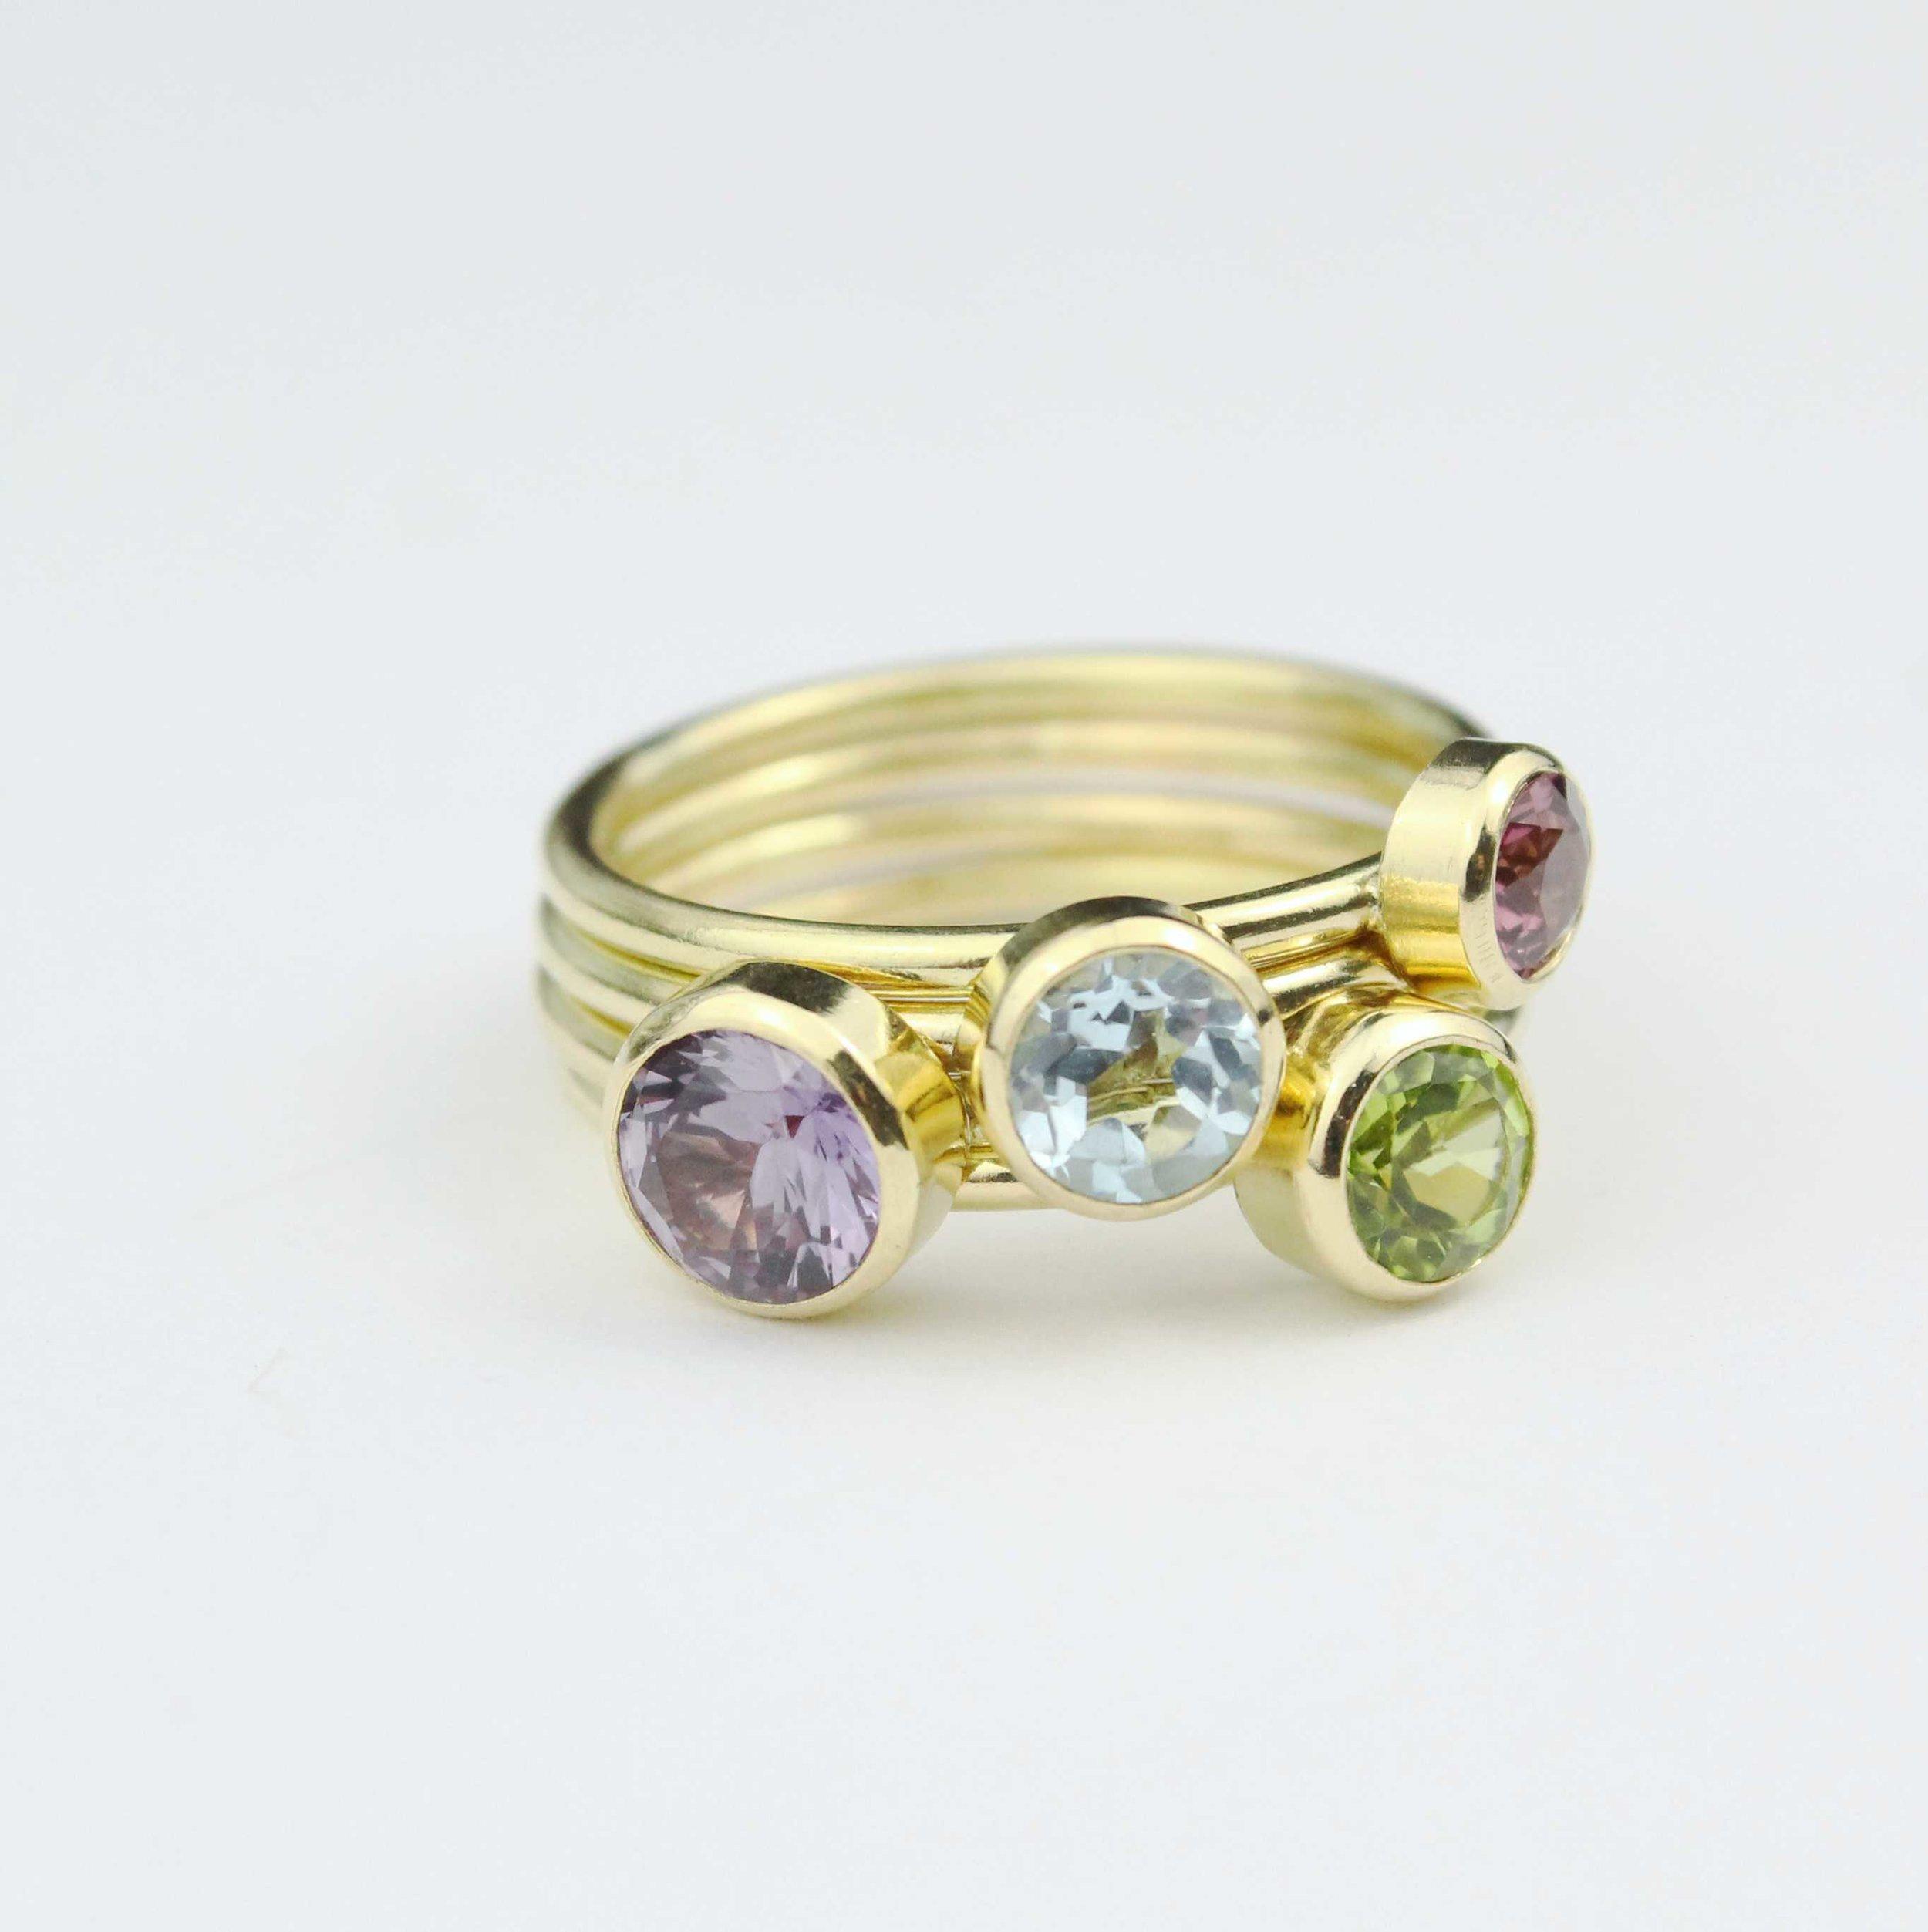 Birthstone Rings and Bespoke -